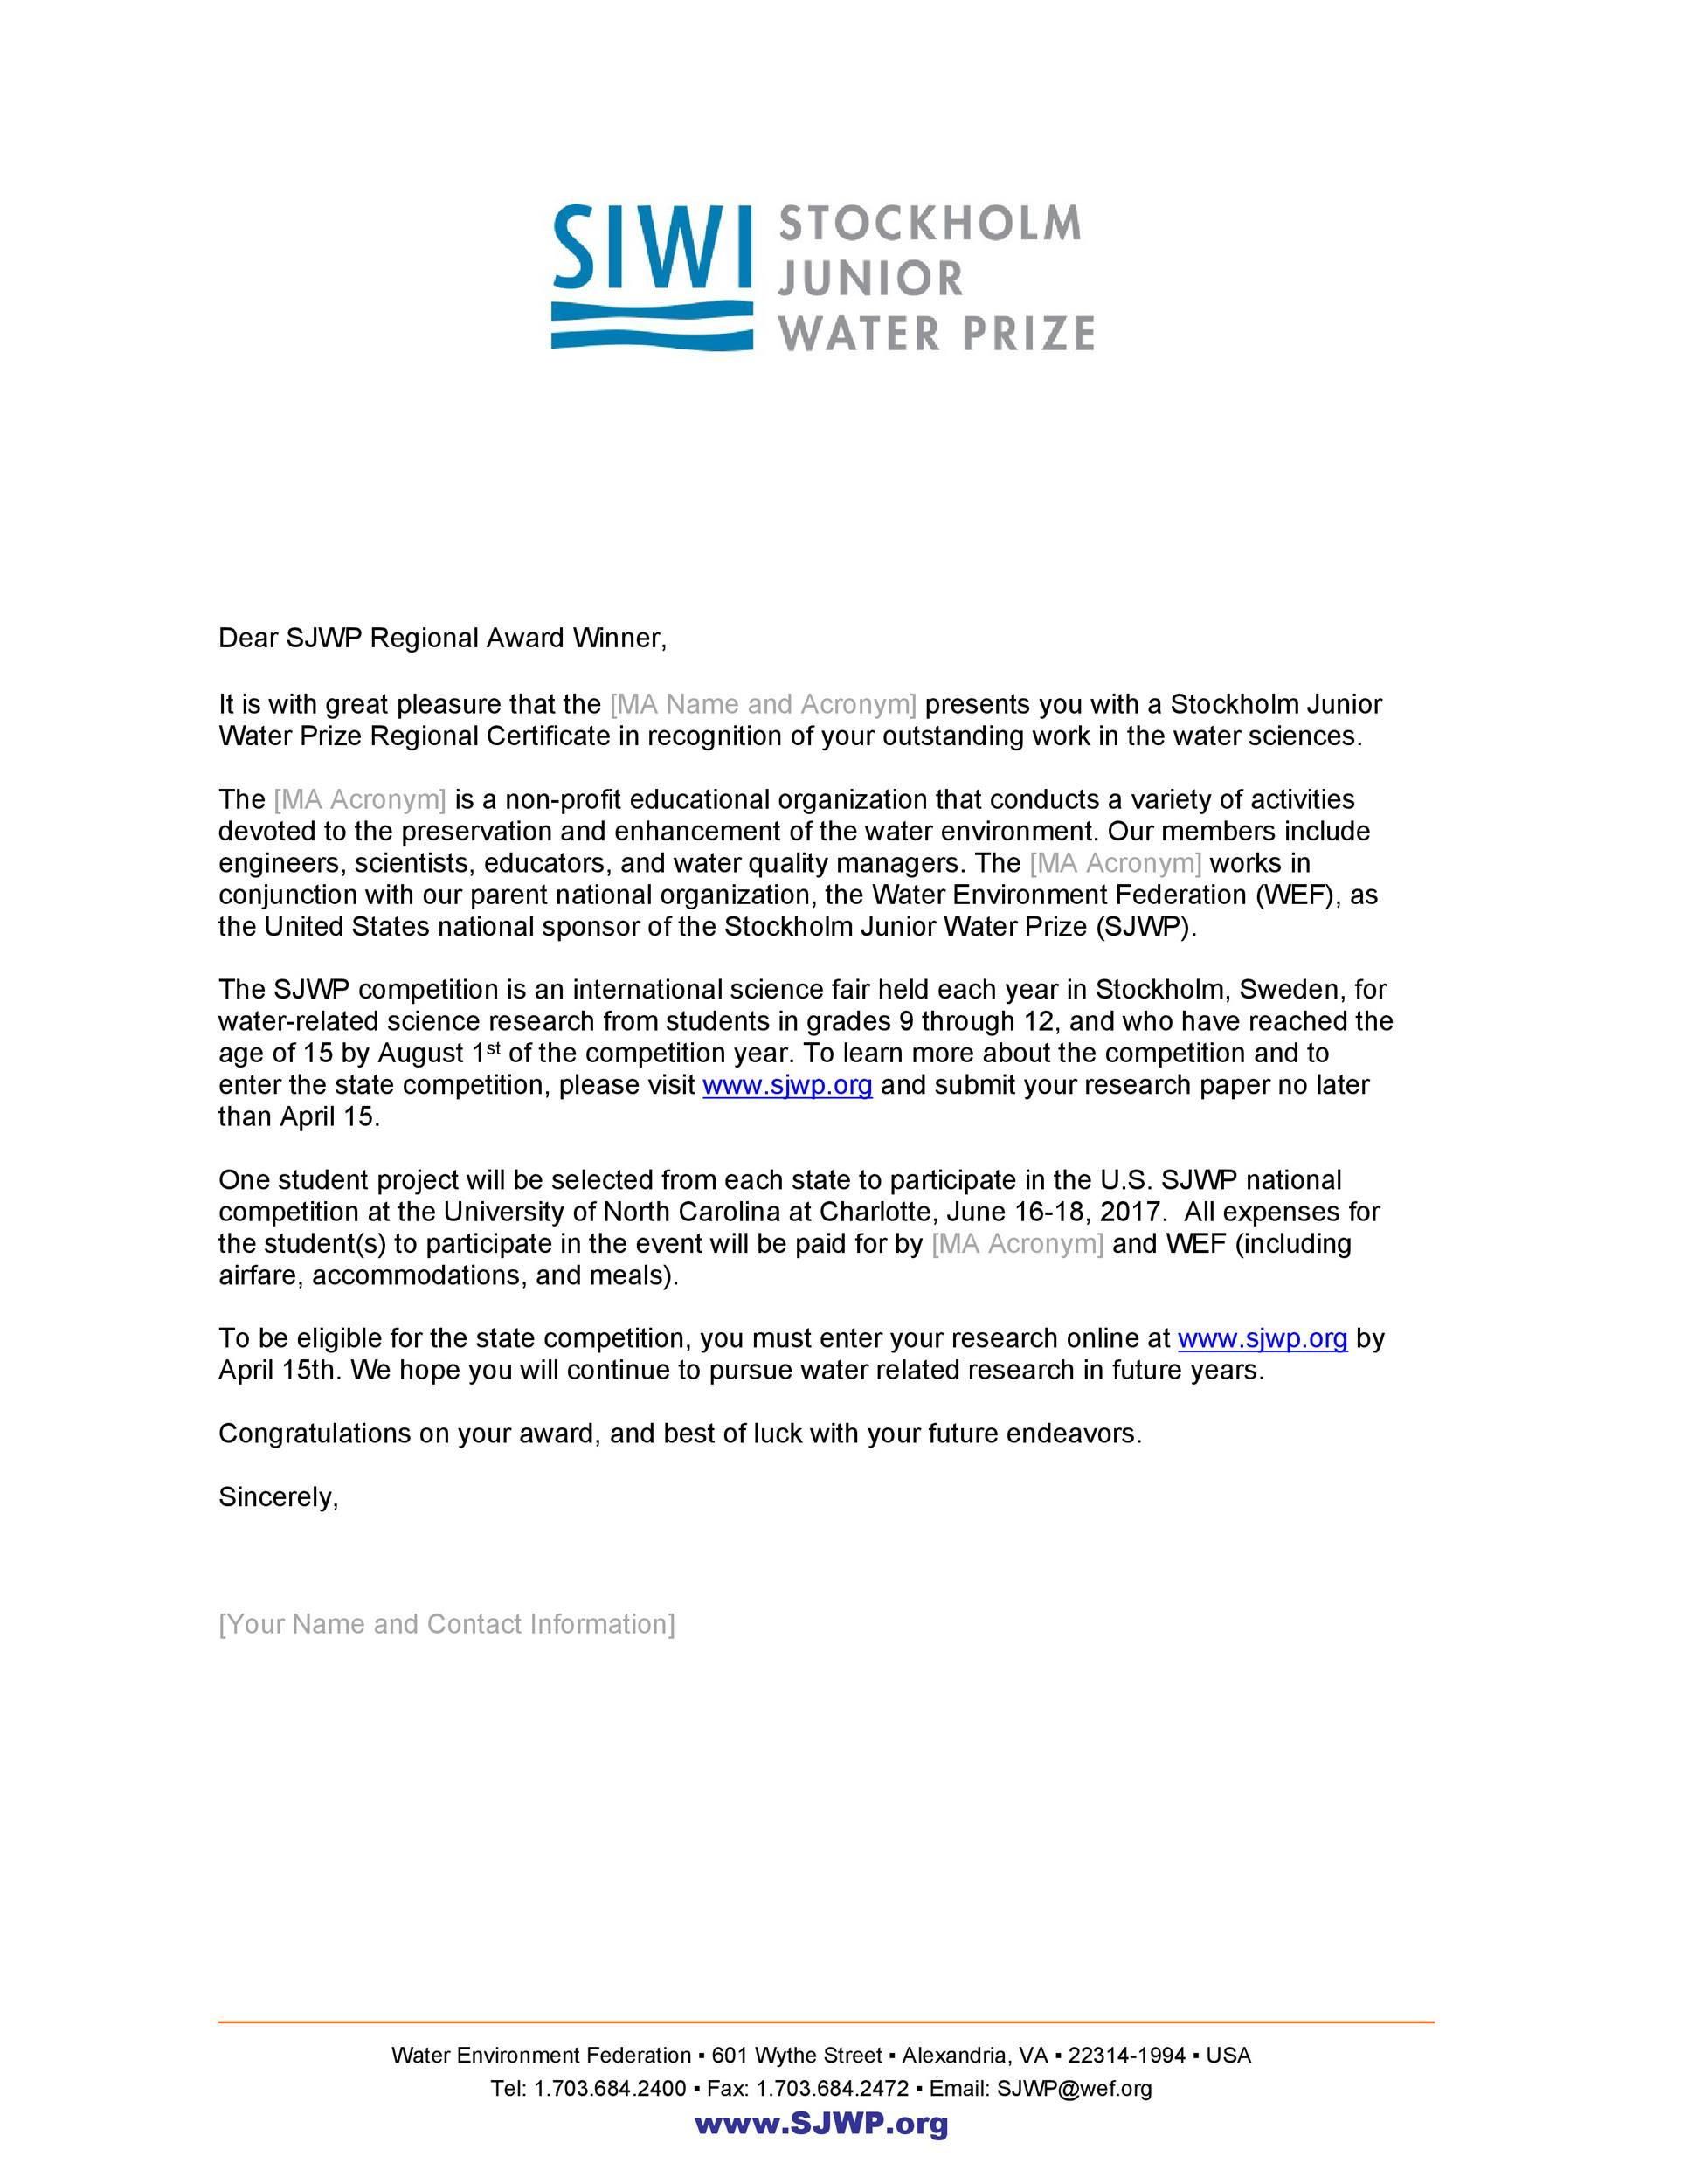 Free congratulations letter 42